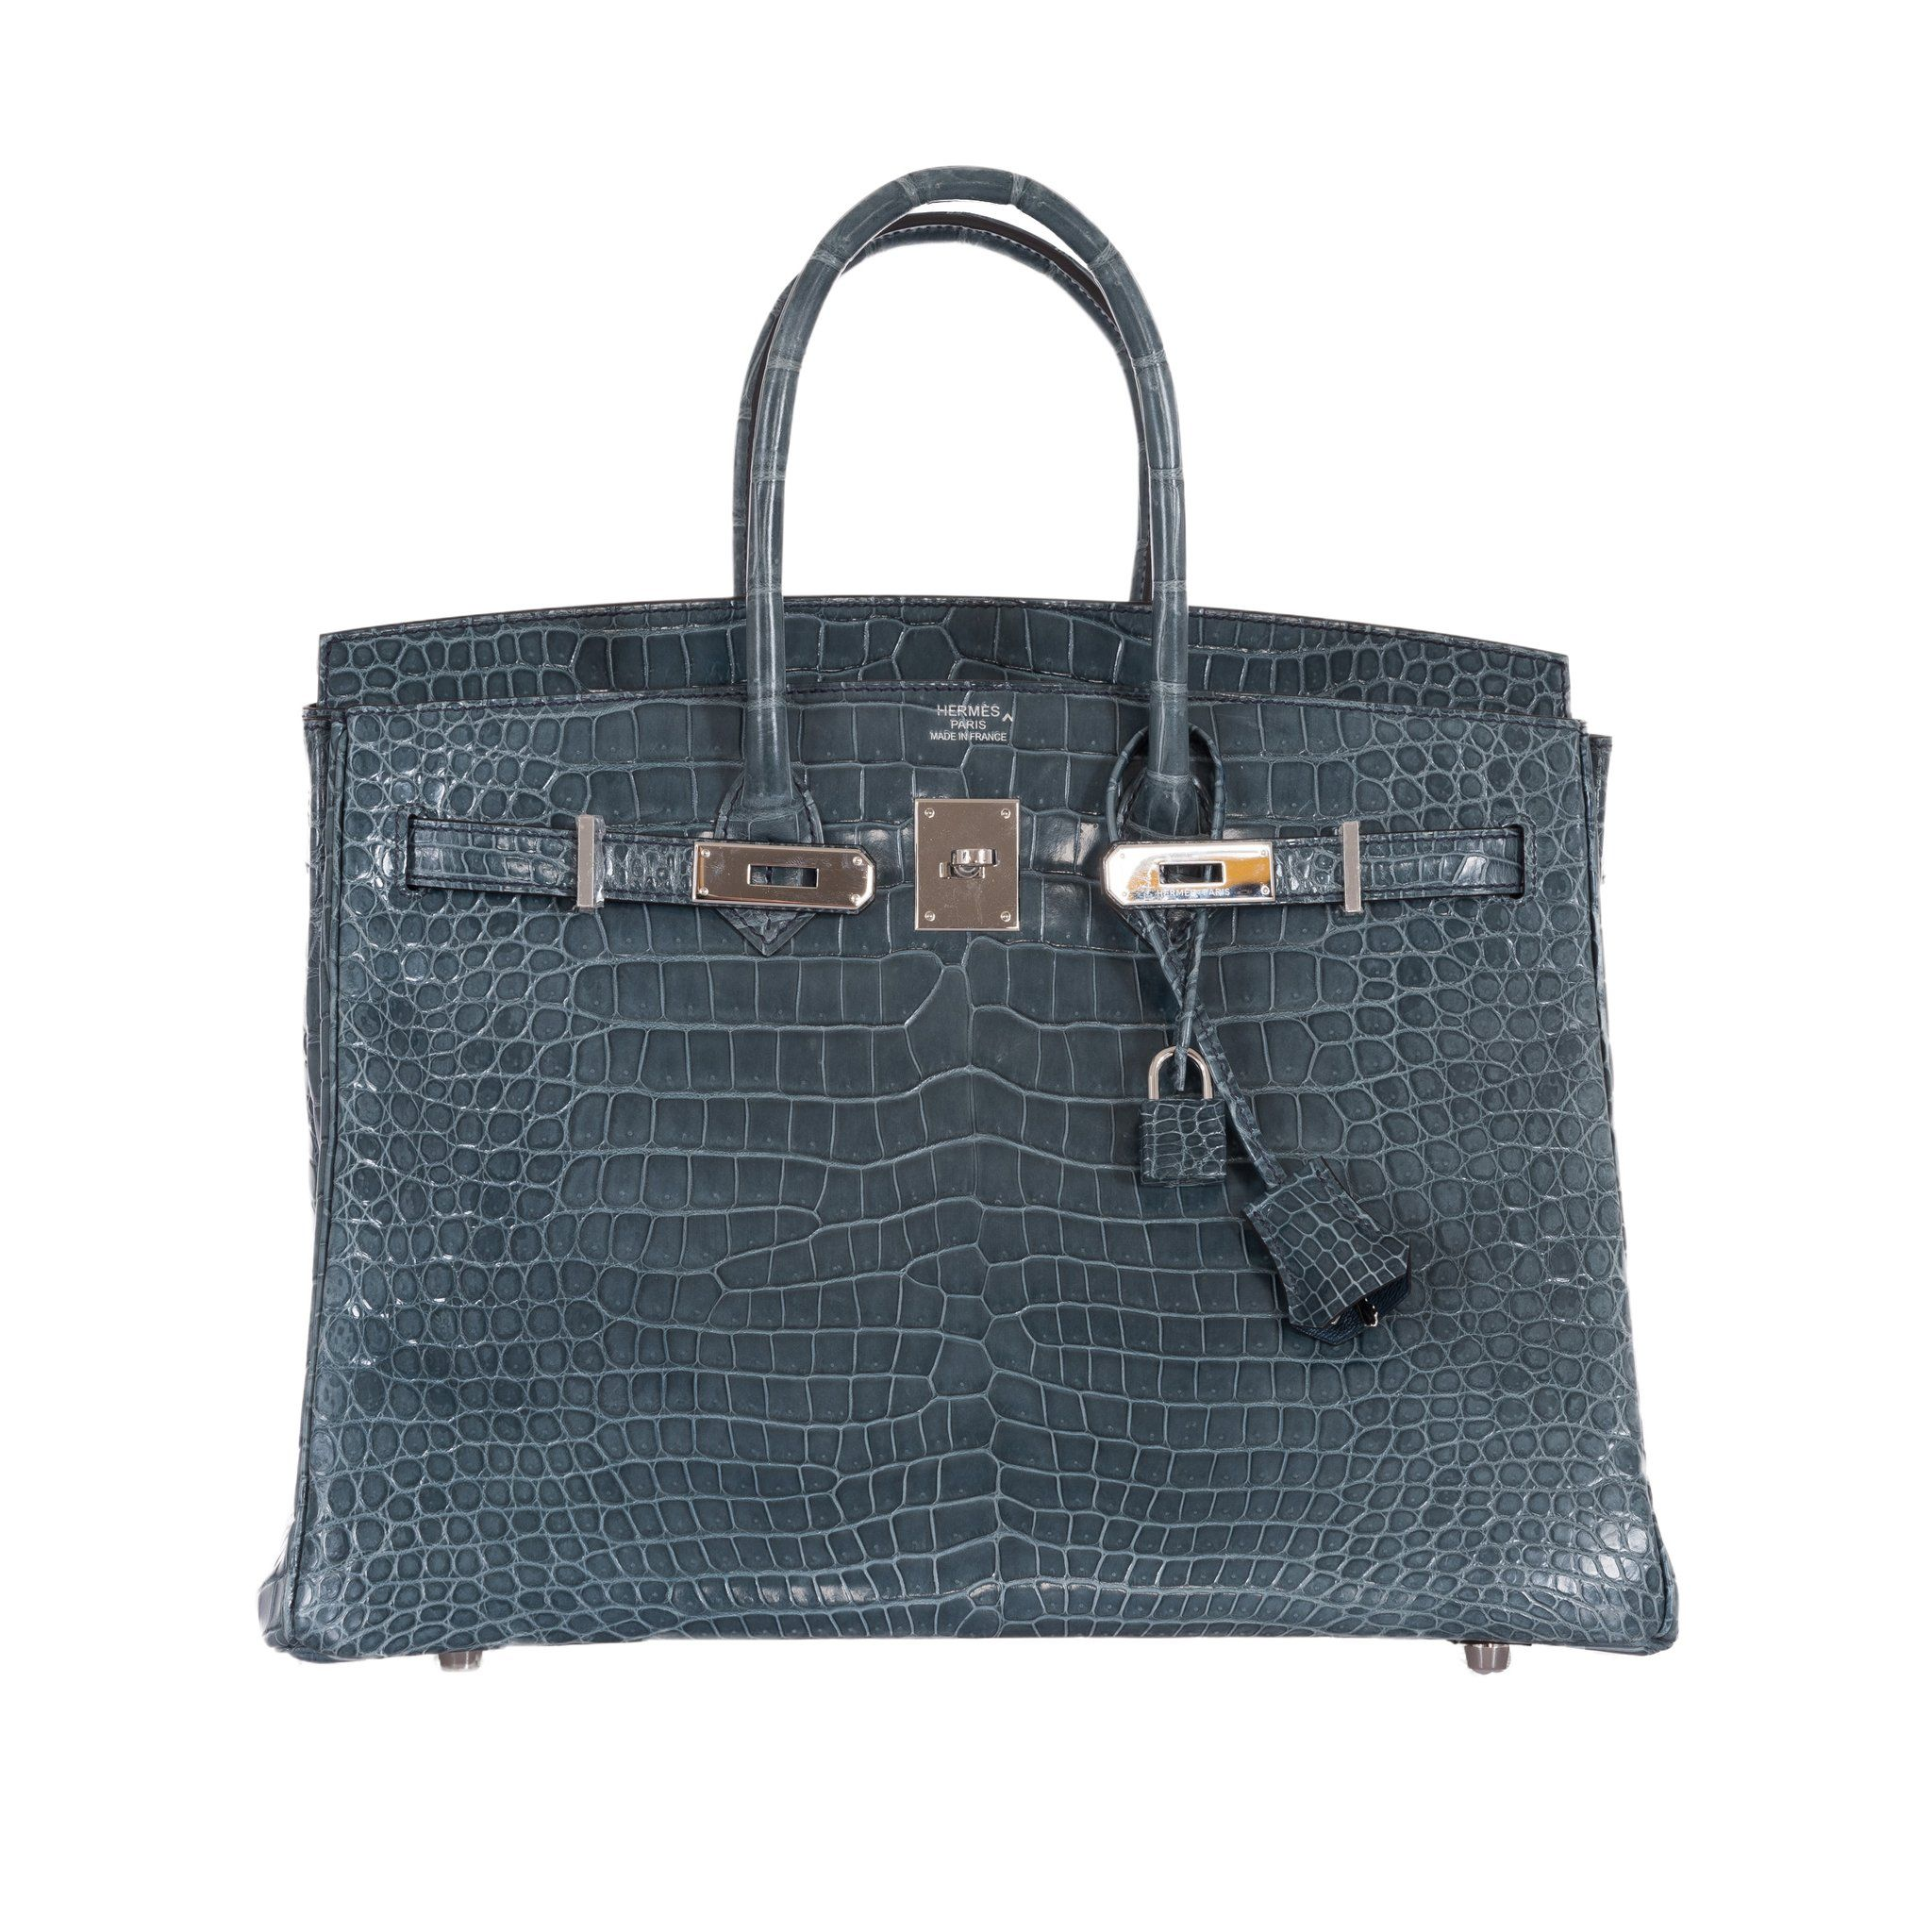 c7ff8f9422 Hermes Birkin 35 Blue Jean Crocodile Porosus Palladium Hardware-Hermes -JaneFinds